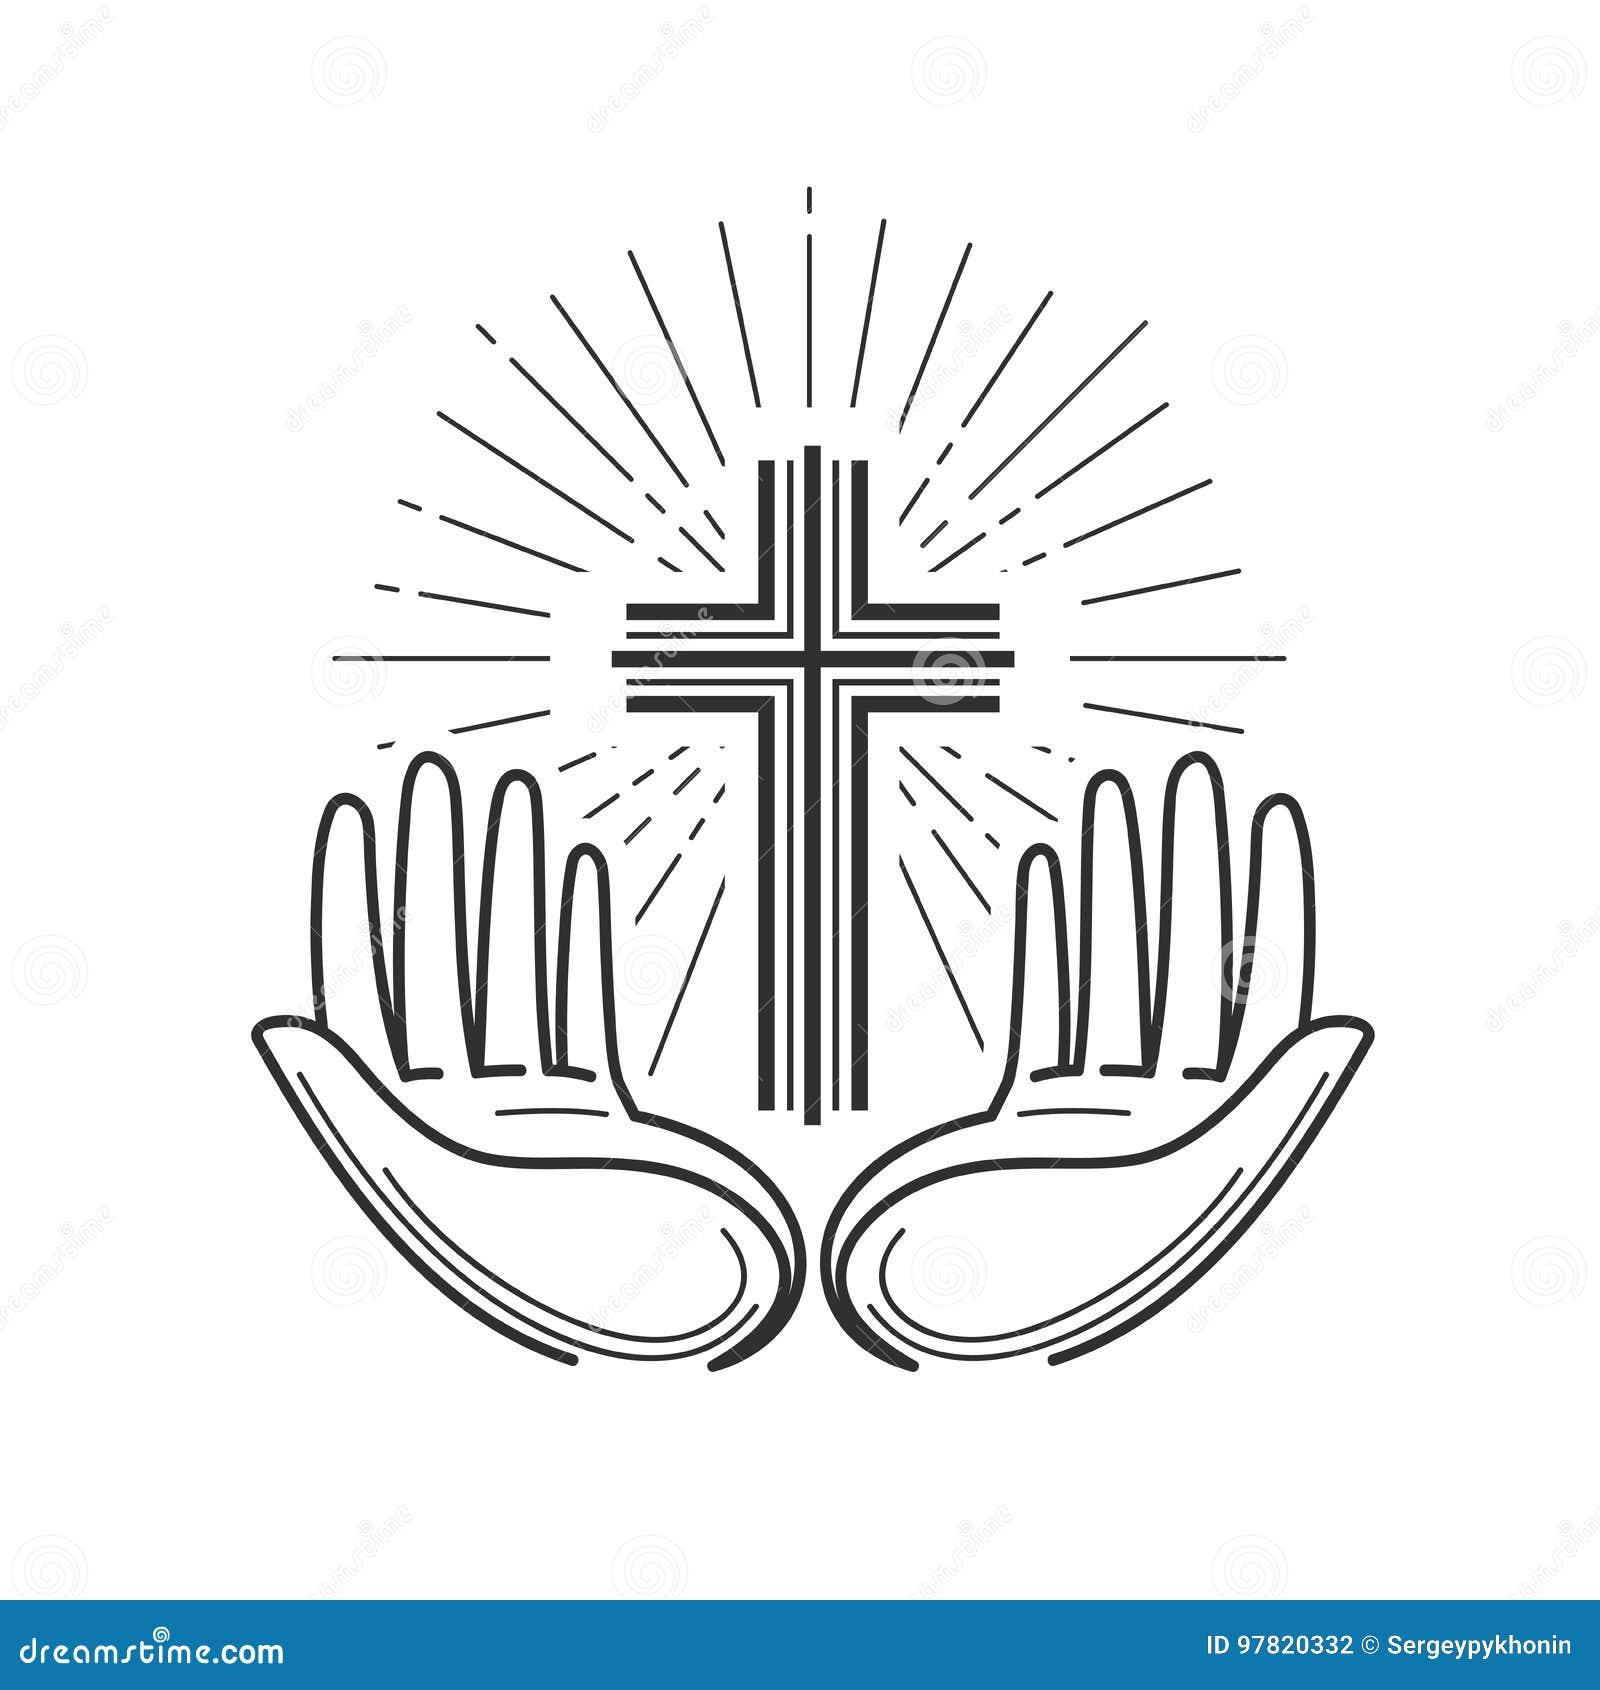 Kirche, Religionslogo Bibel, Kreuzigung, Kreuz, Gebetsikone oder Symbol Lineares Design, Vektorillustration